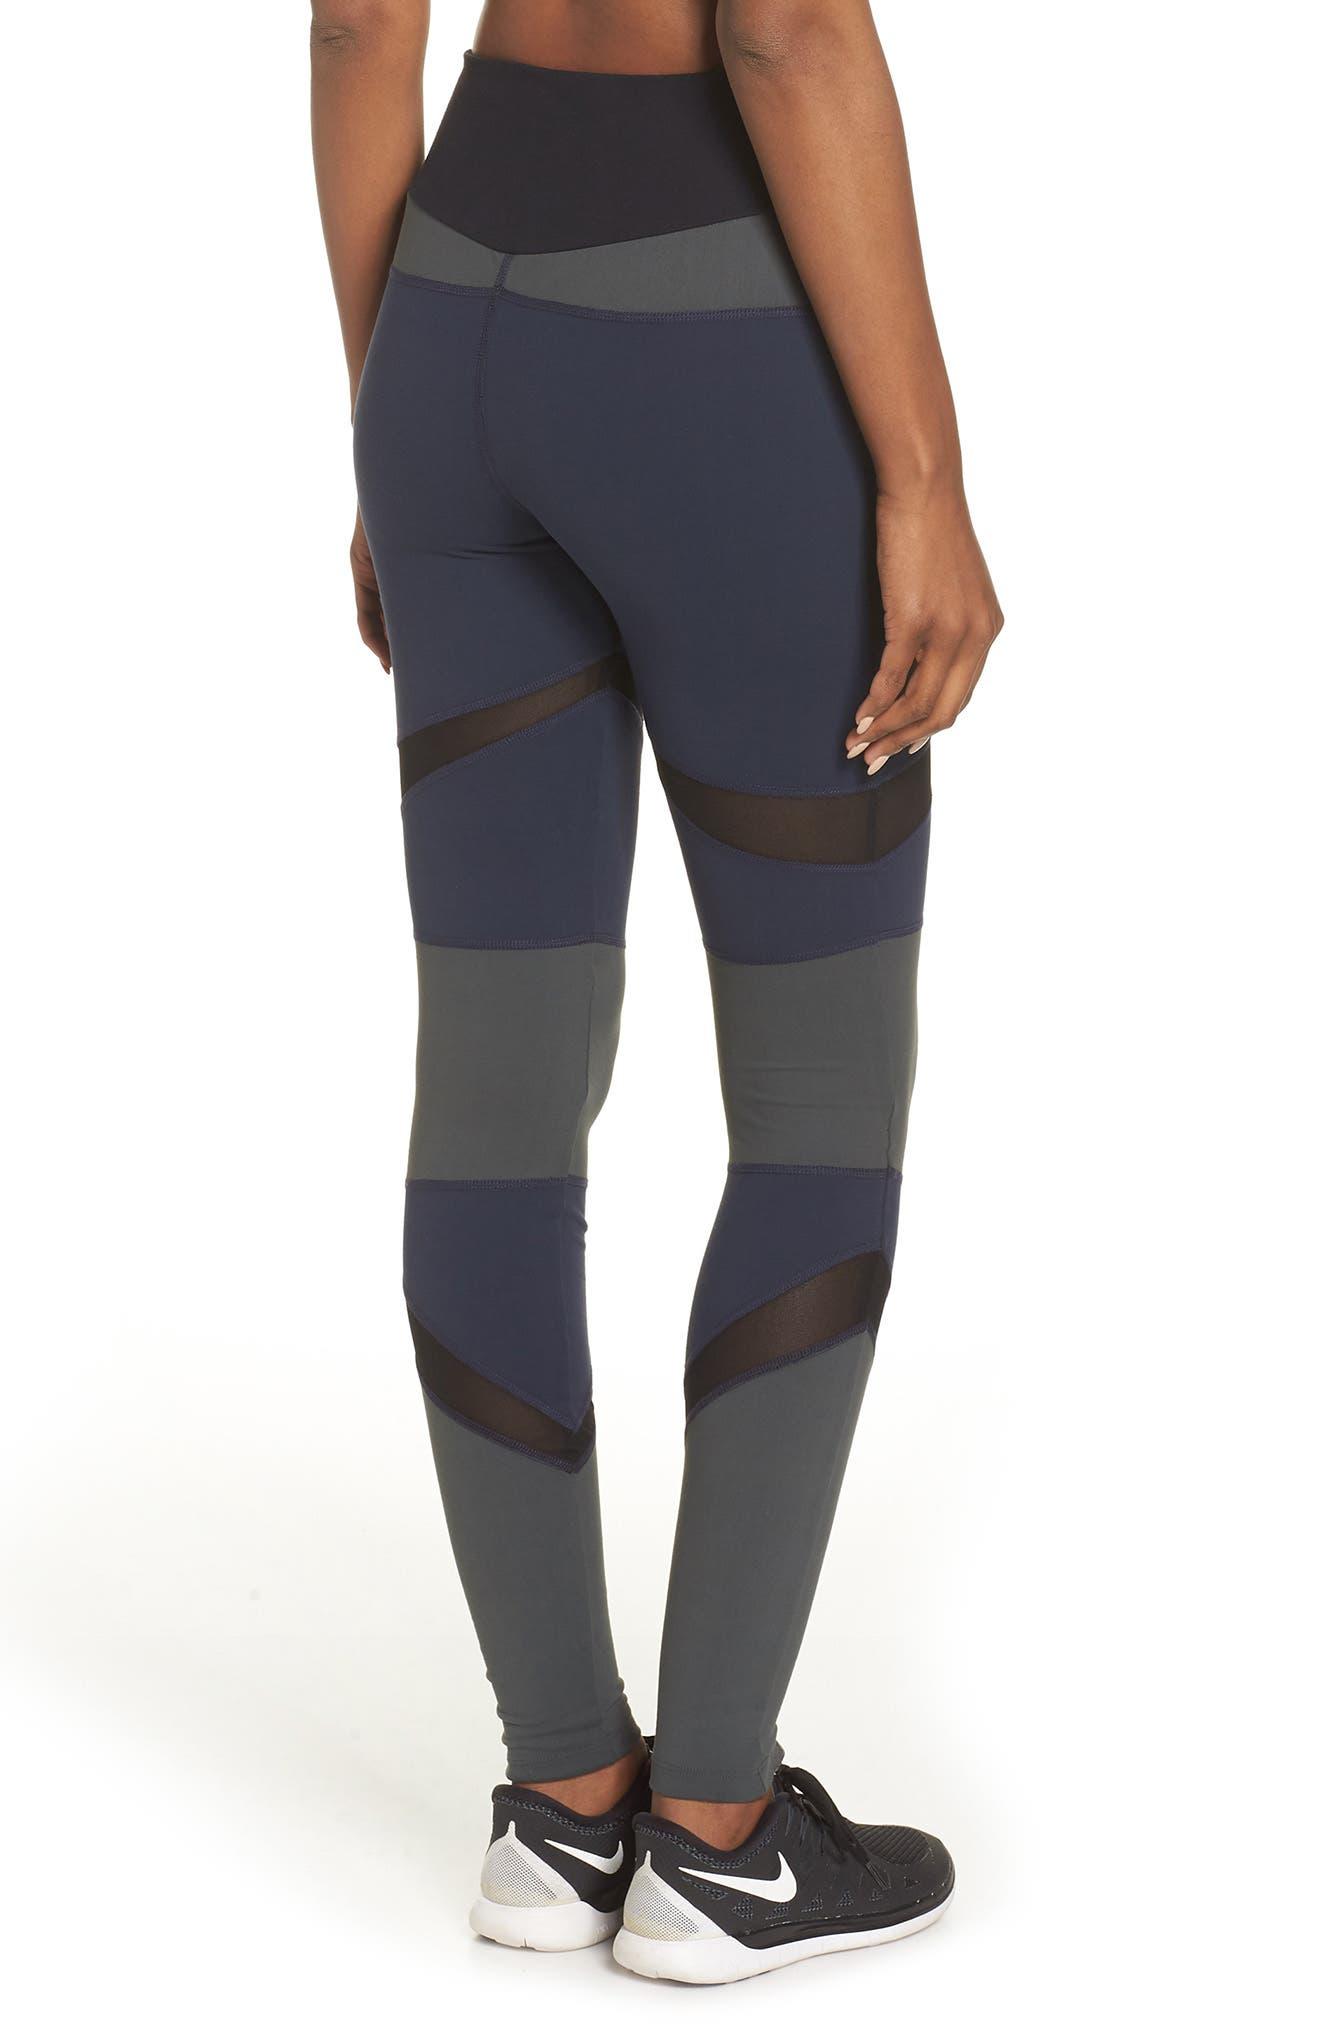 BoomBoom Athletica Brushed Tricolor Panel Leggings,                             Alternate thumbnail 2, color,                             NAVY/ BLACK/ GREEN